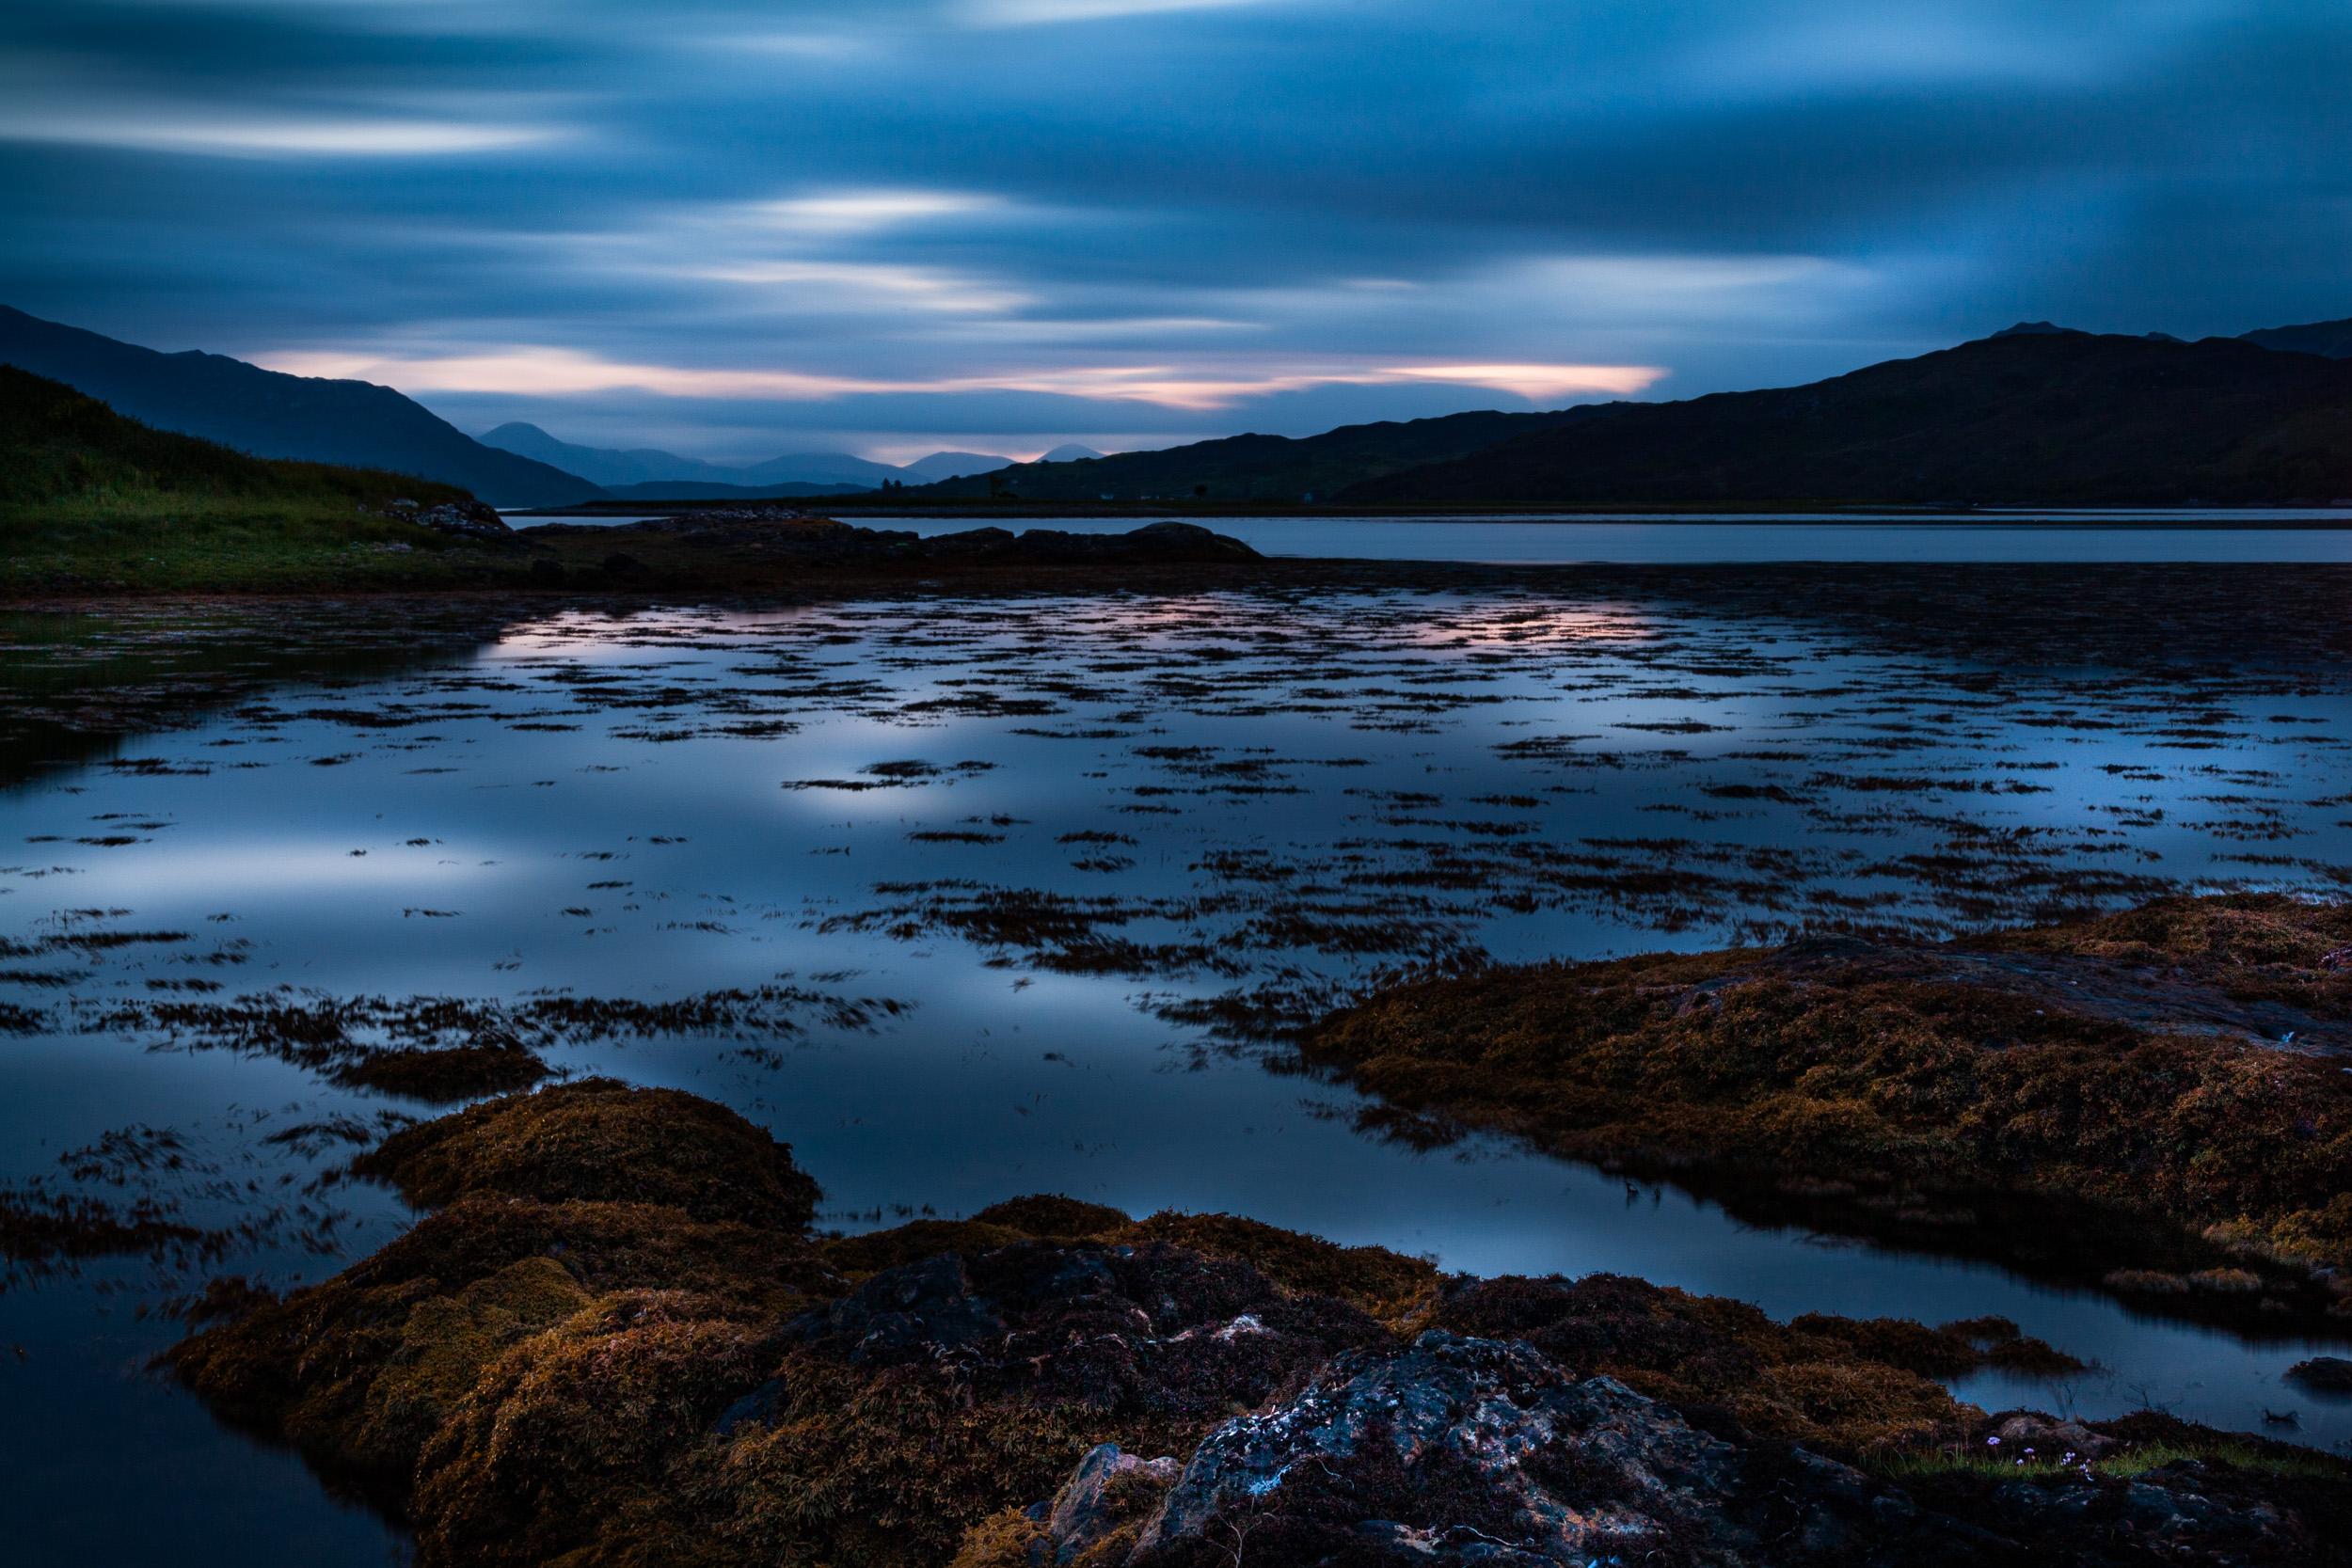 Dornee, Kyle of Loch Alsh, Scotland. Canon 5D, Canon EF 50mm f/2.5 macro lens. 4 minutes, f/22, ISO 100.